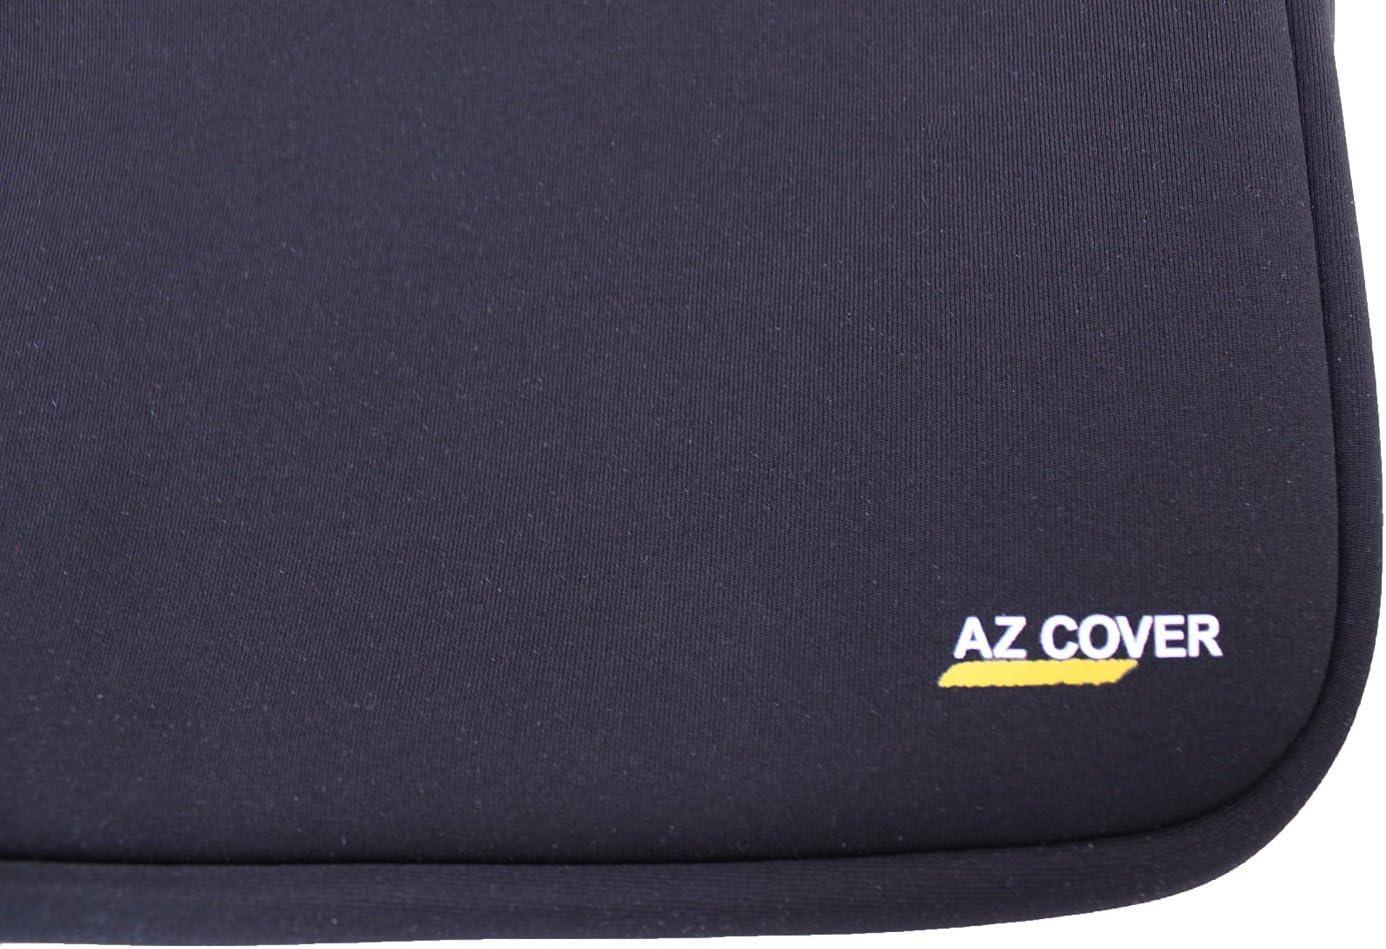 Black For Hewlett Packard HP Stream 13 Computer Tablet Laptop PC AZ-Cover 13.3 Inch Laptop Sleeve case